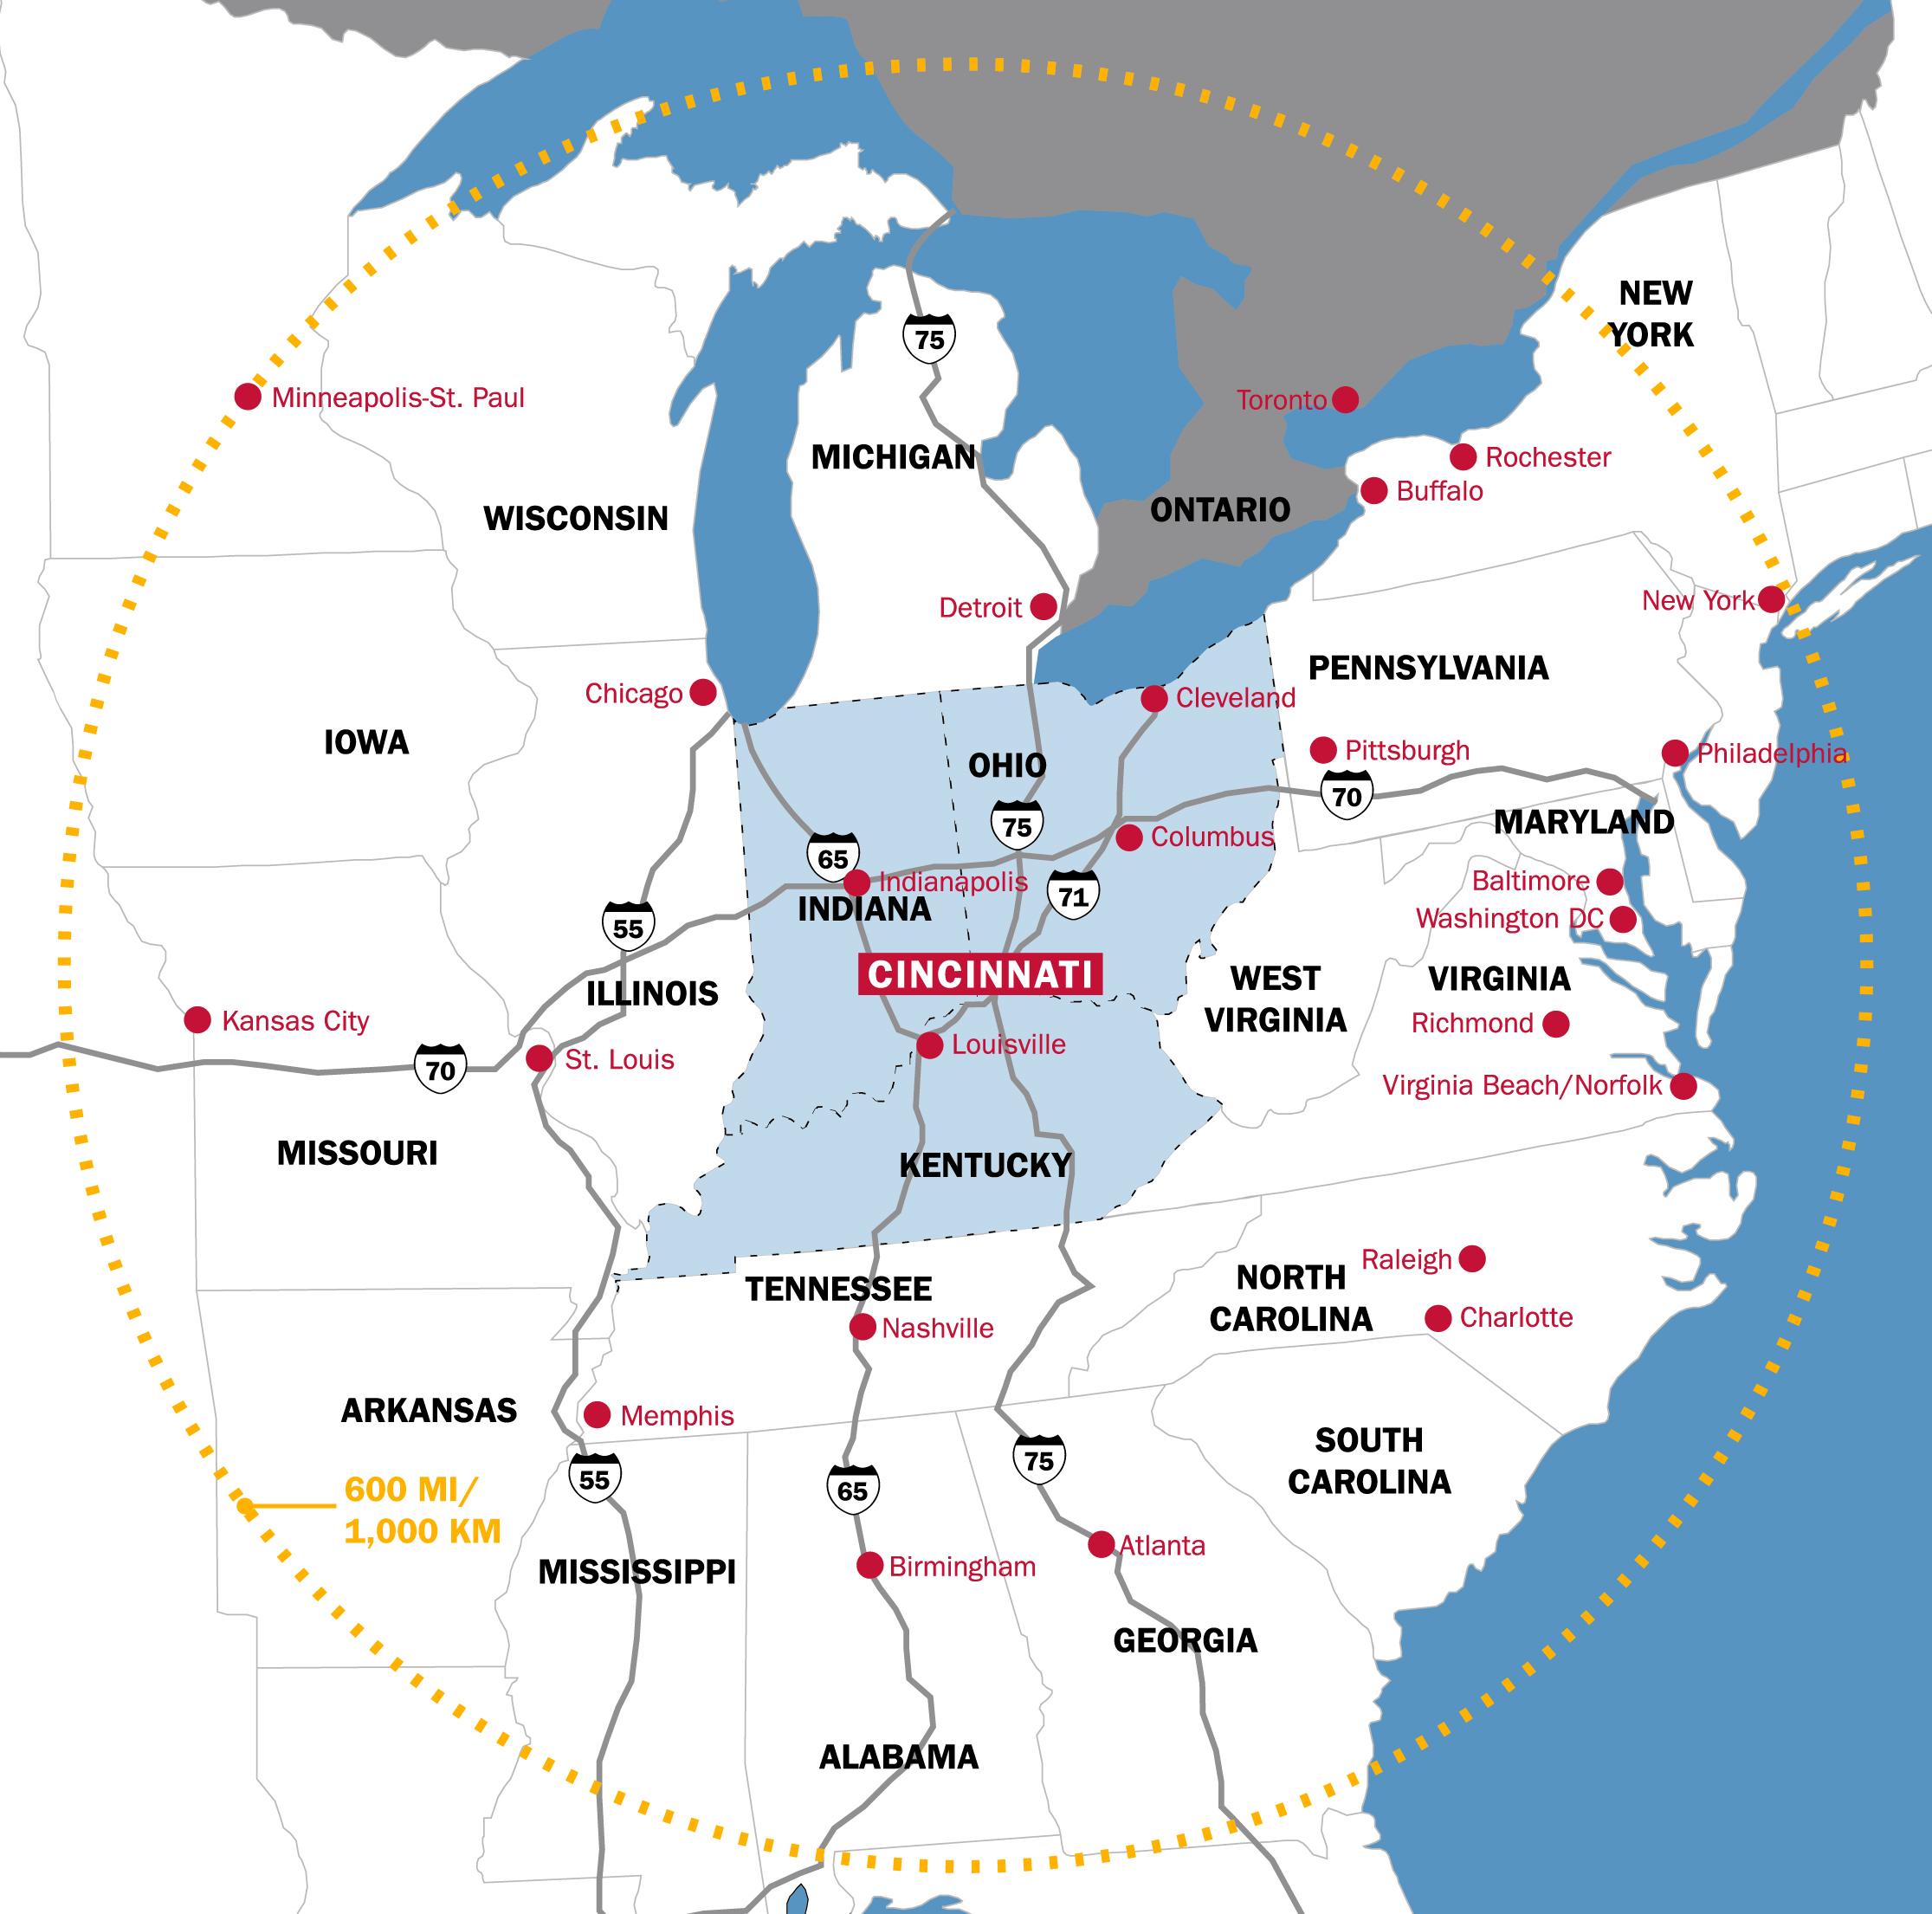 GCCC0453-MidwestCitiesMapFlyer2011-FINo